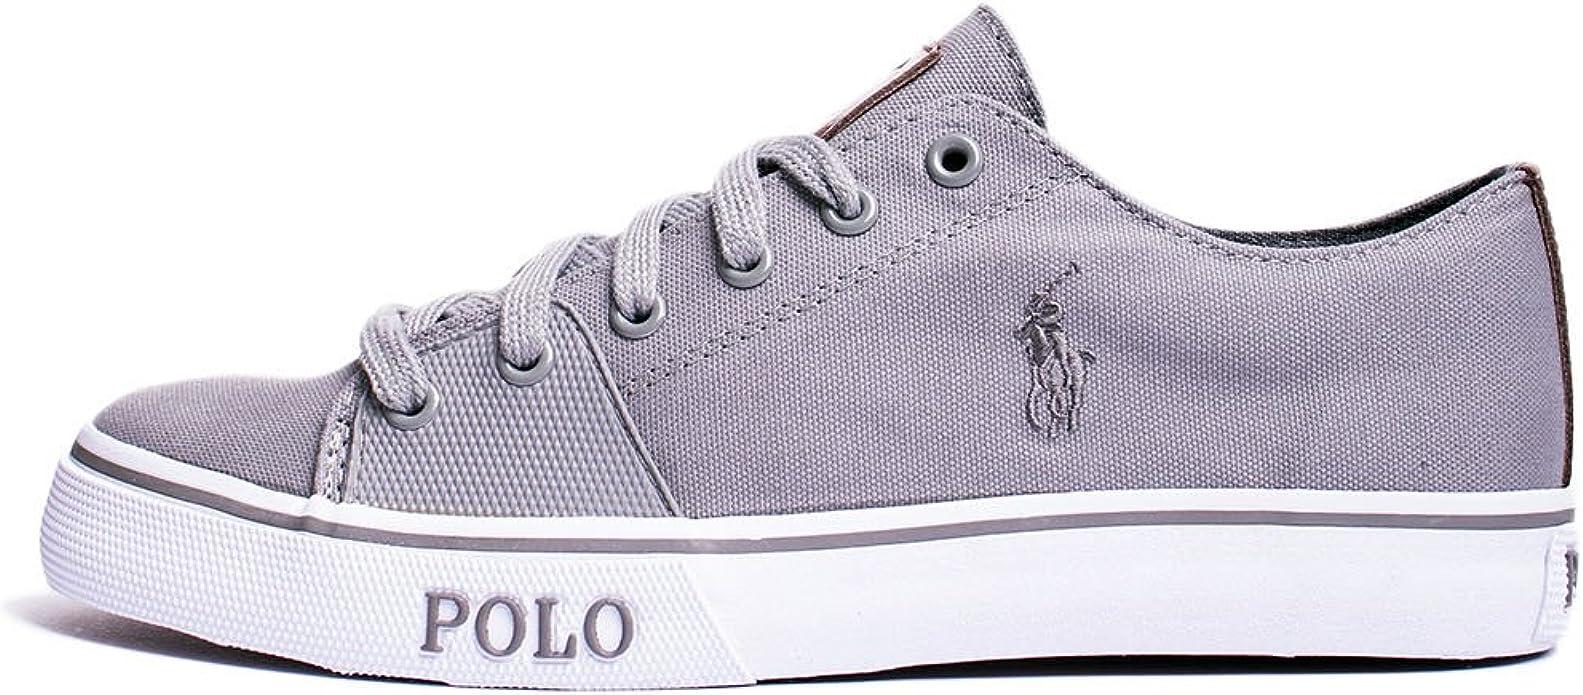 Polo Ralph Lauren – Zapatillas Bajas para Hombre – Sneakers ...